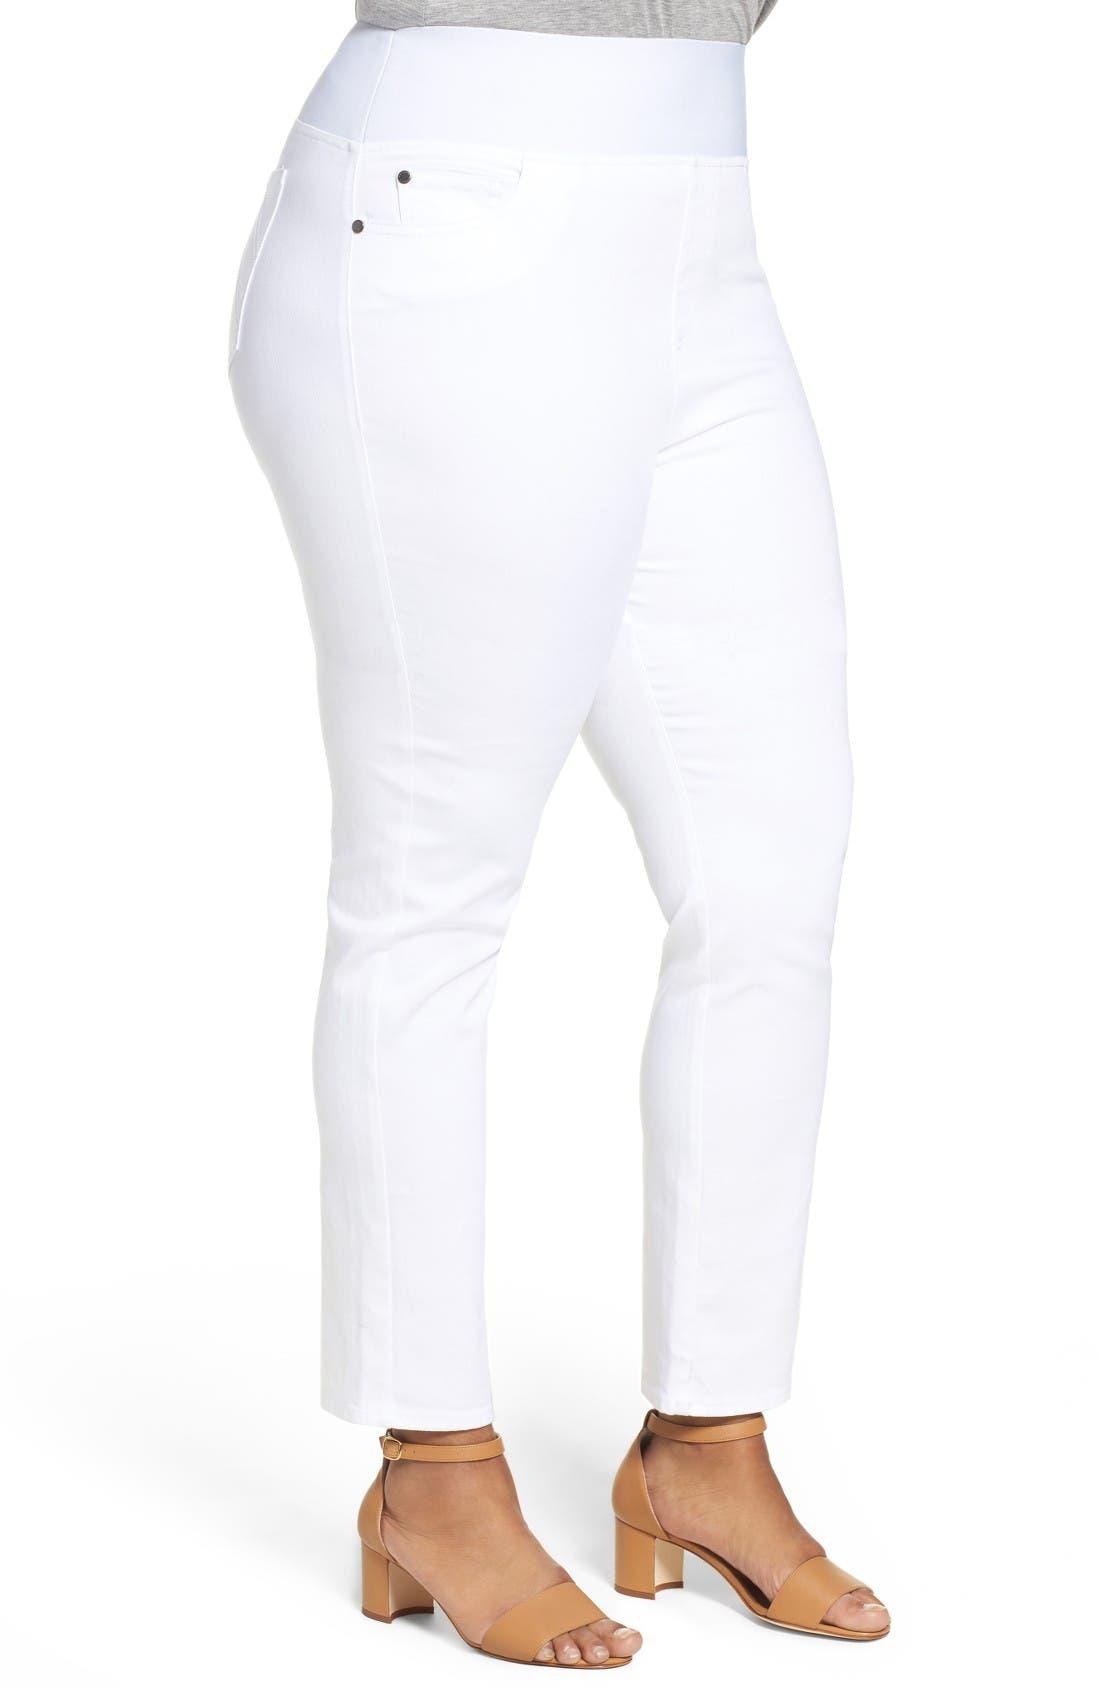 Alternate Image 3  - Foxcroft Nina Slimming Pull-On Legging Jeans (Plus Size)